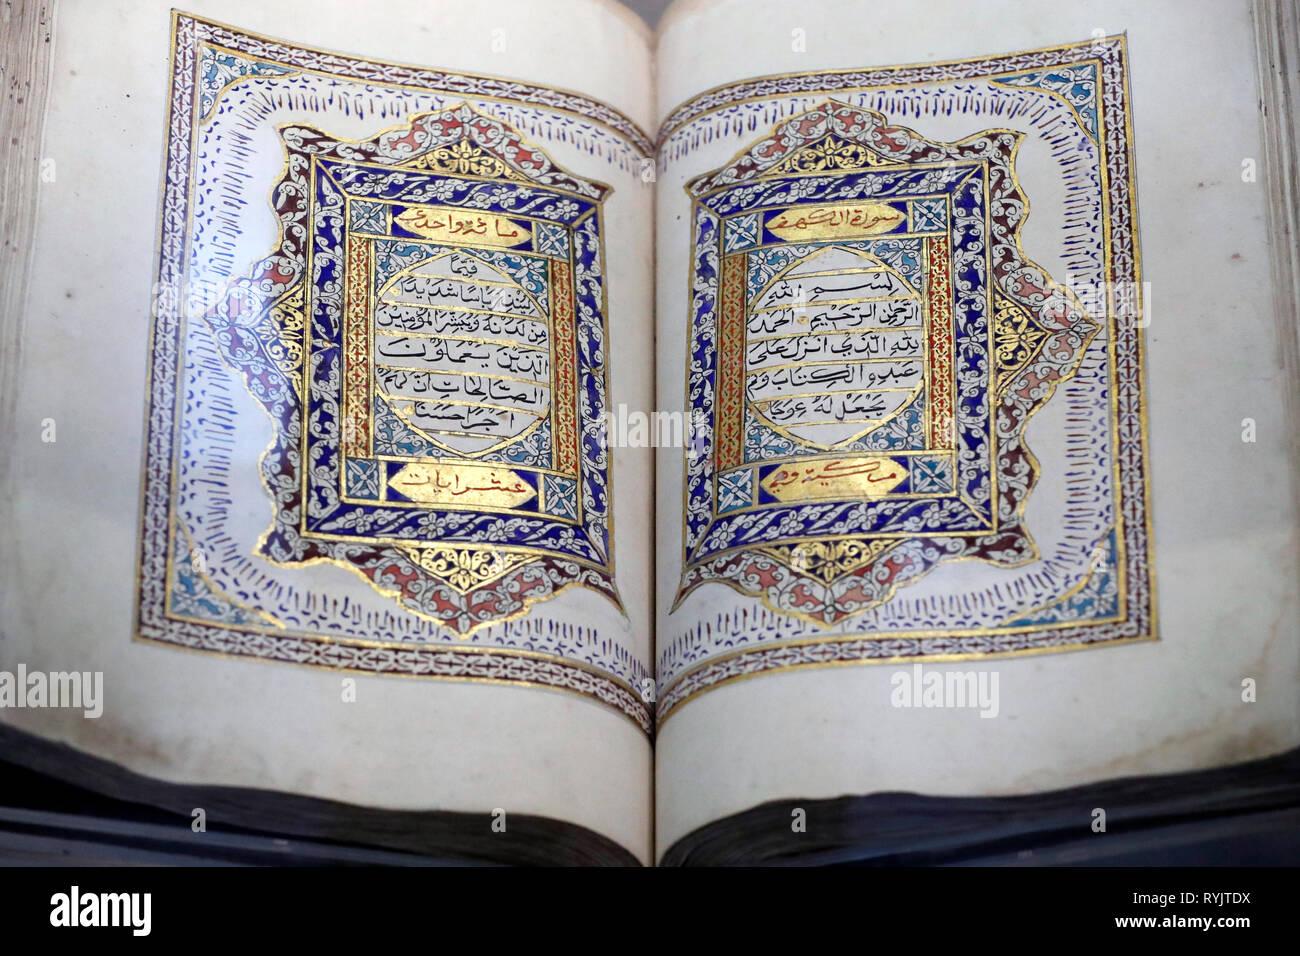 Asian Civilisations Museum.  Quran.Myanmar, late 19th century. Singapore. - Stock Image